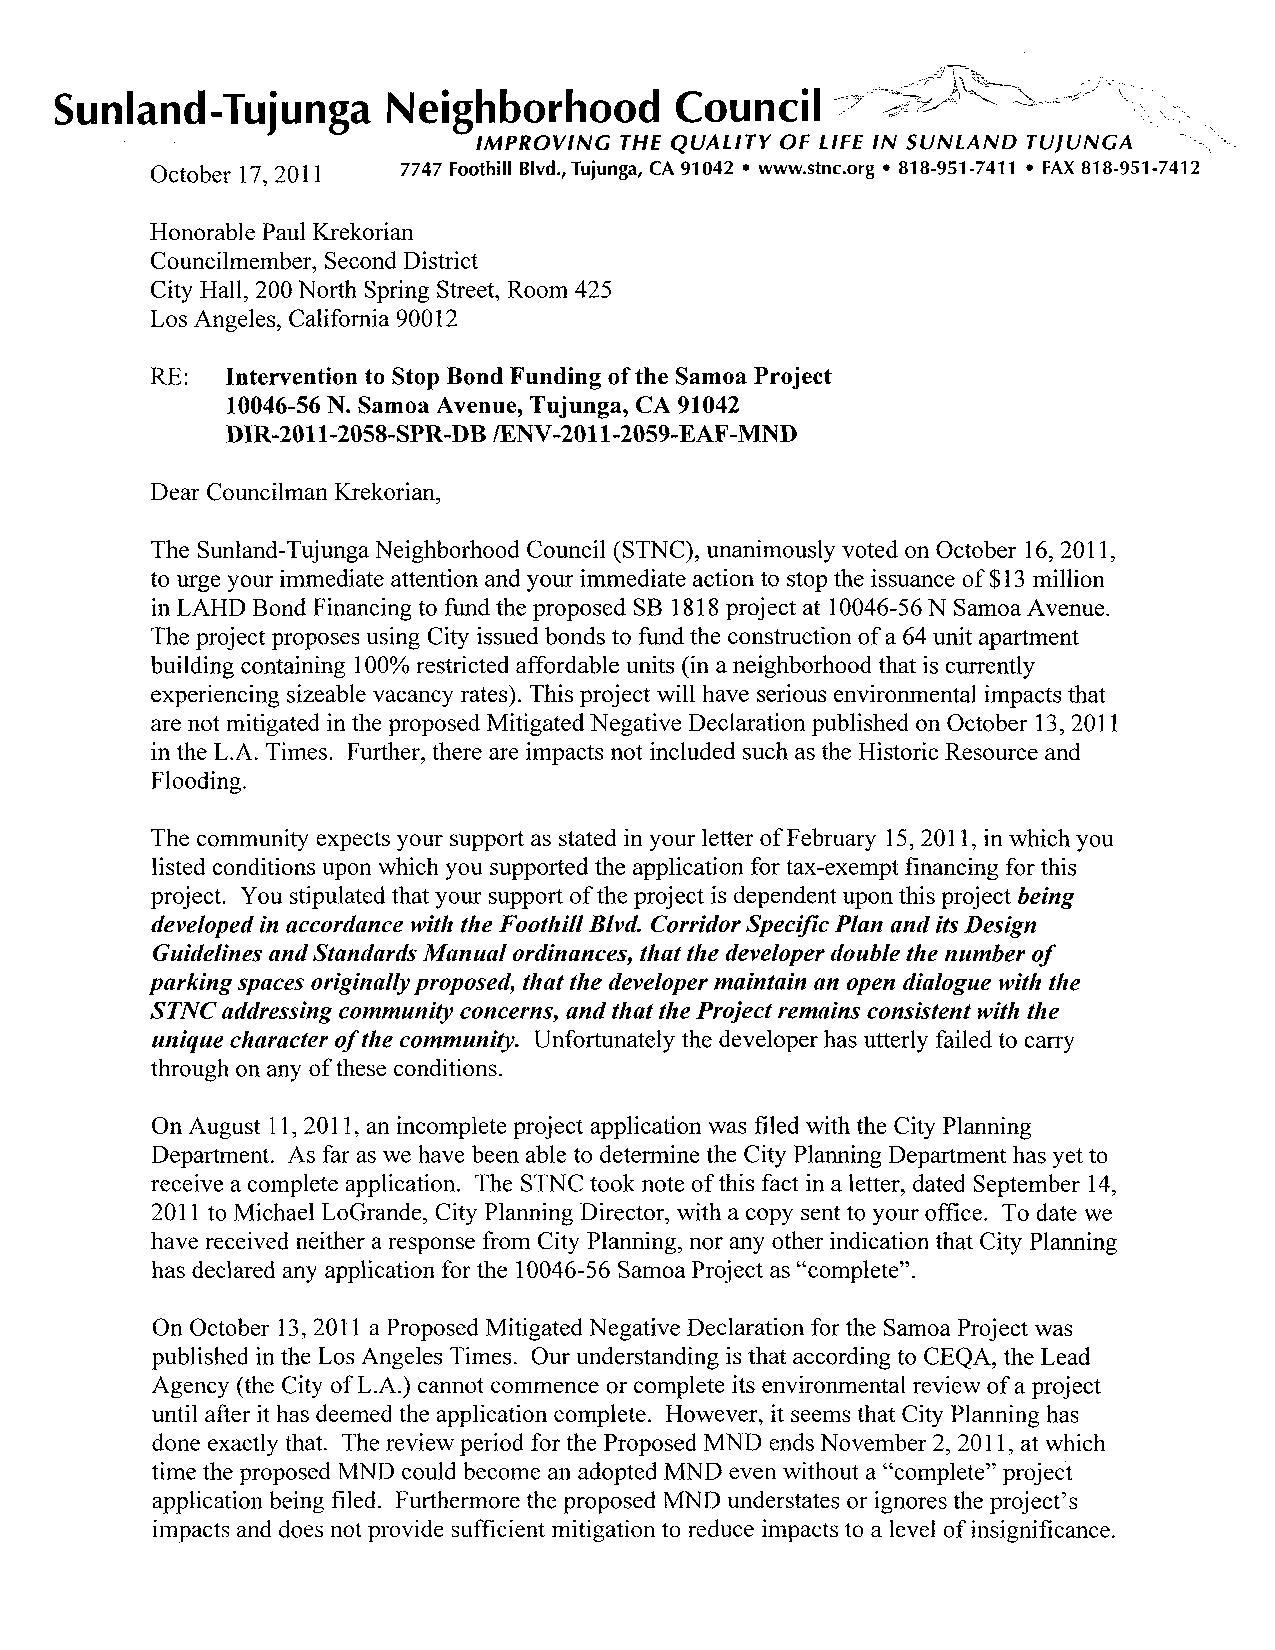 STNC Demands Action from CM Krekorian SunlandTujunga Alliance